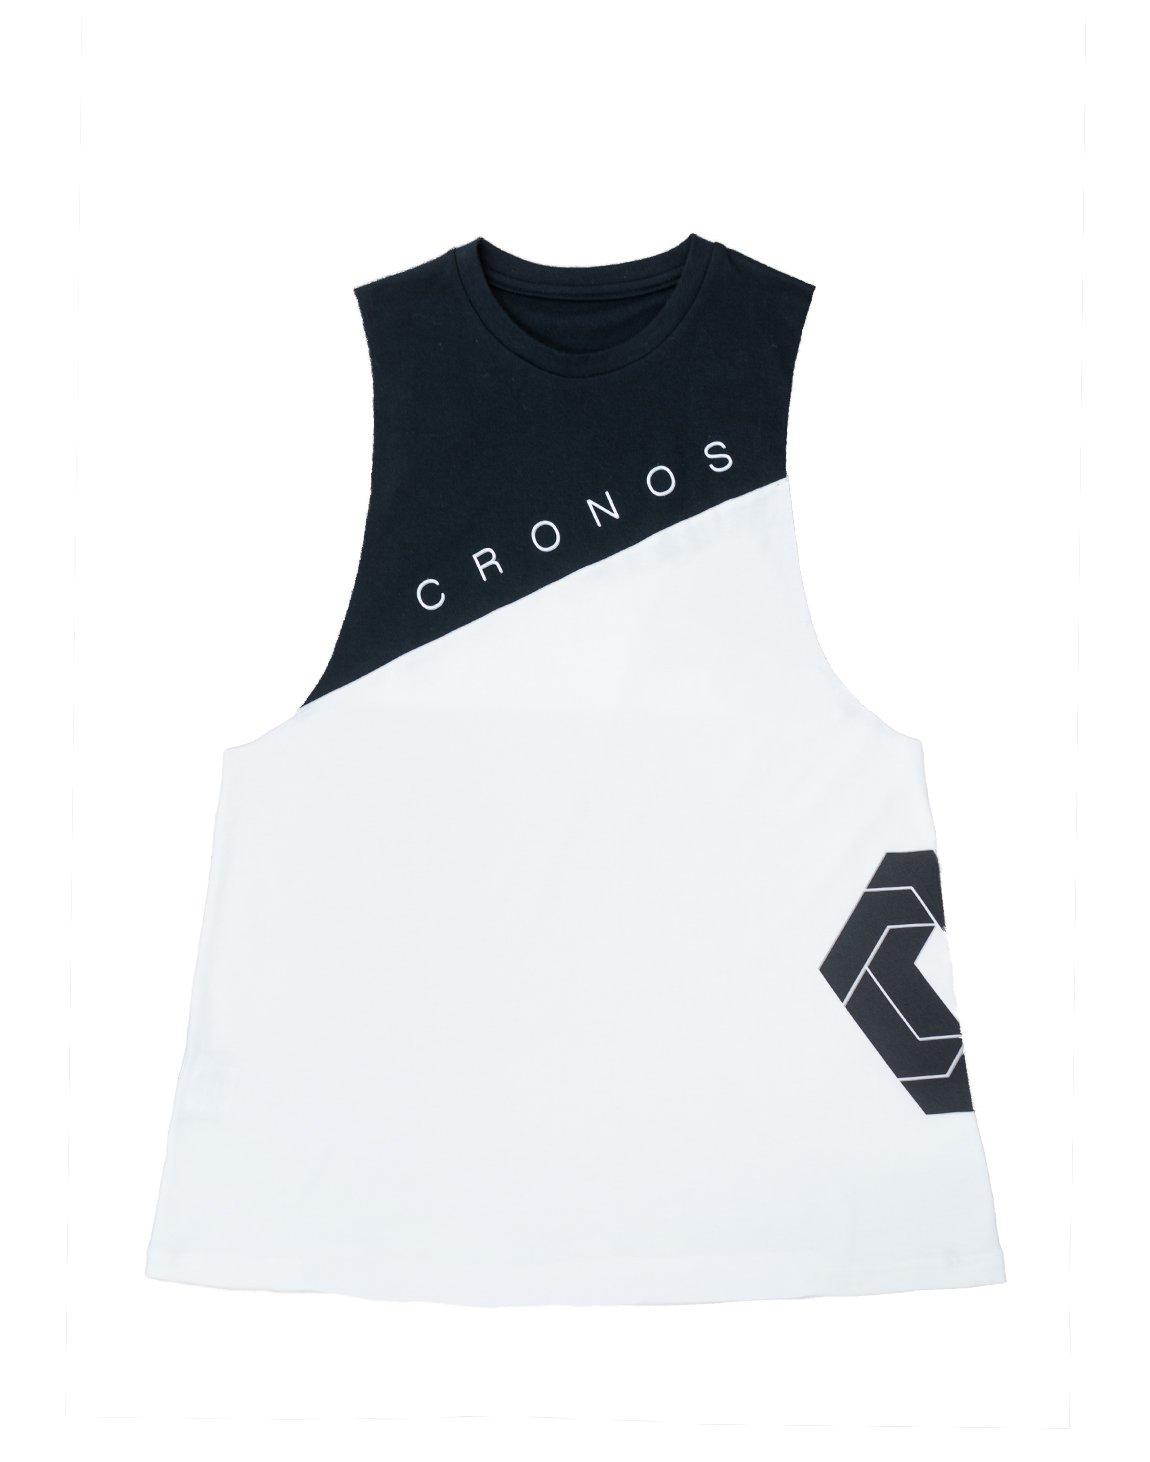 CRONOS NEW Bi-COLOR TANK TOP【WHITE×BLACK】